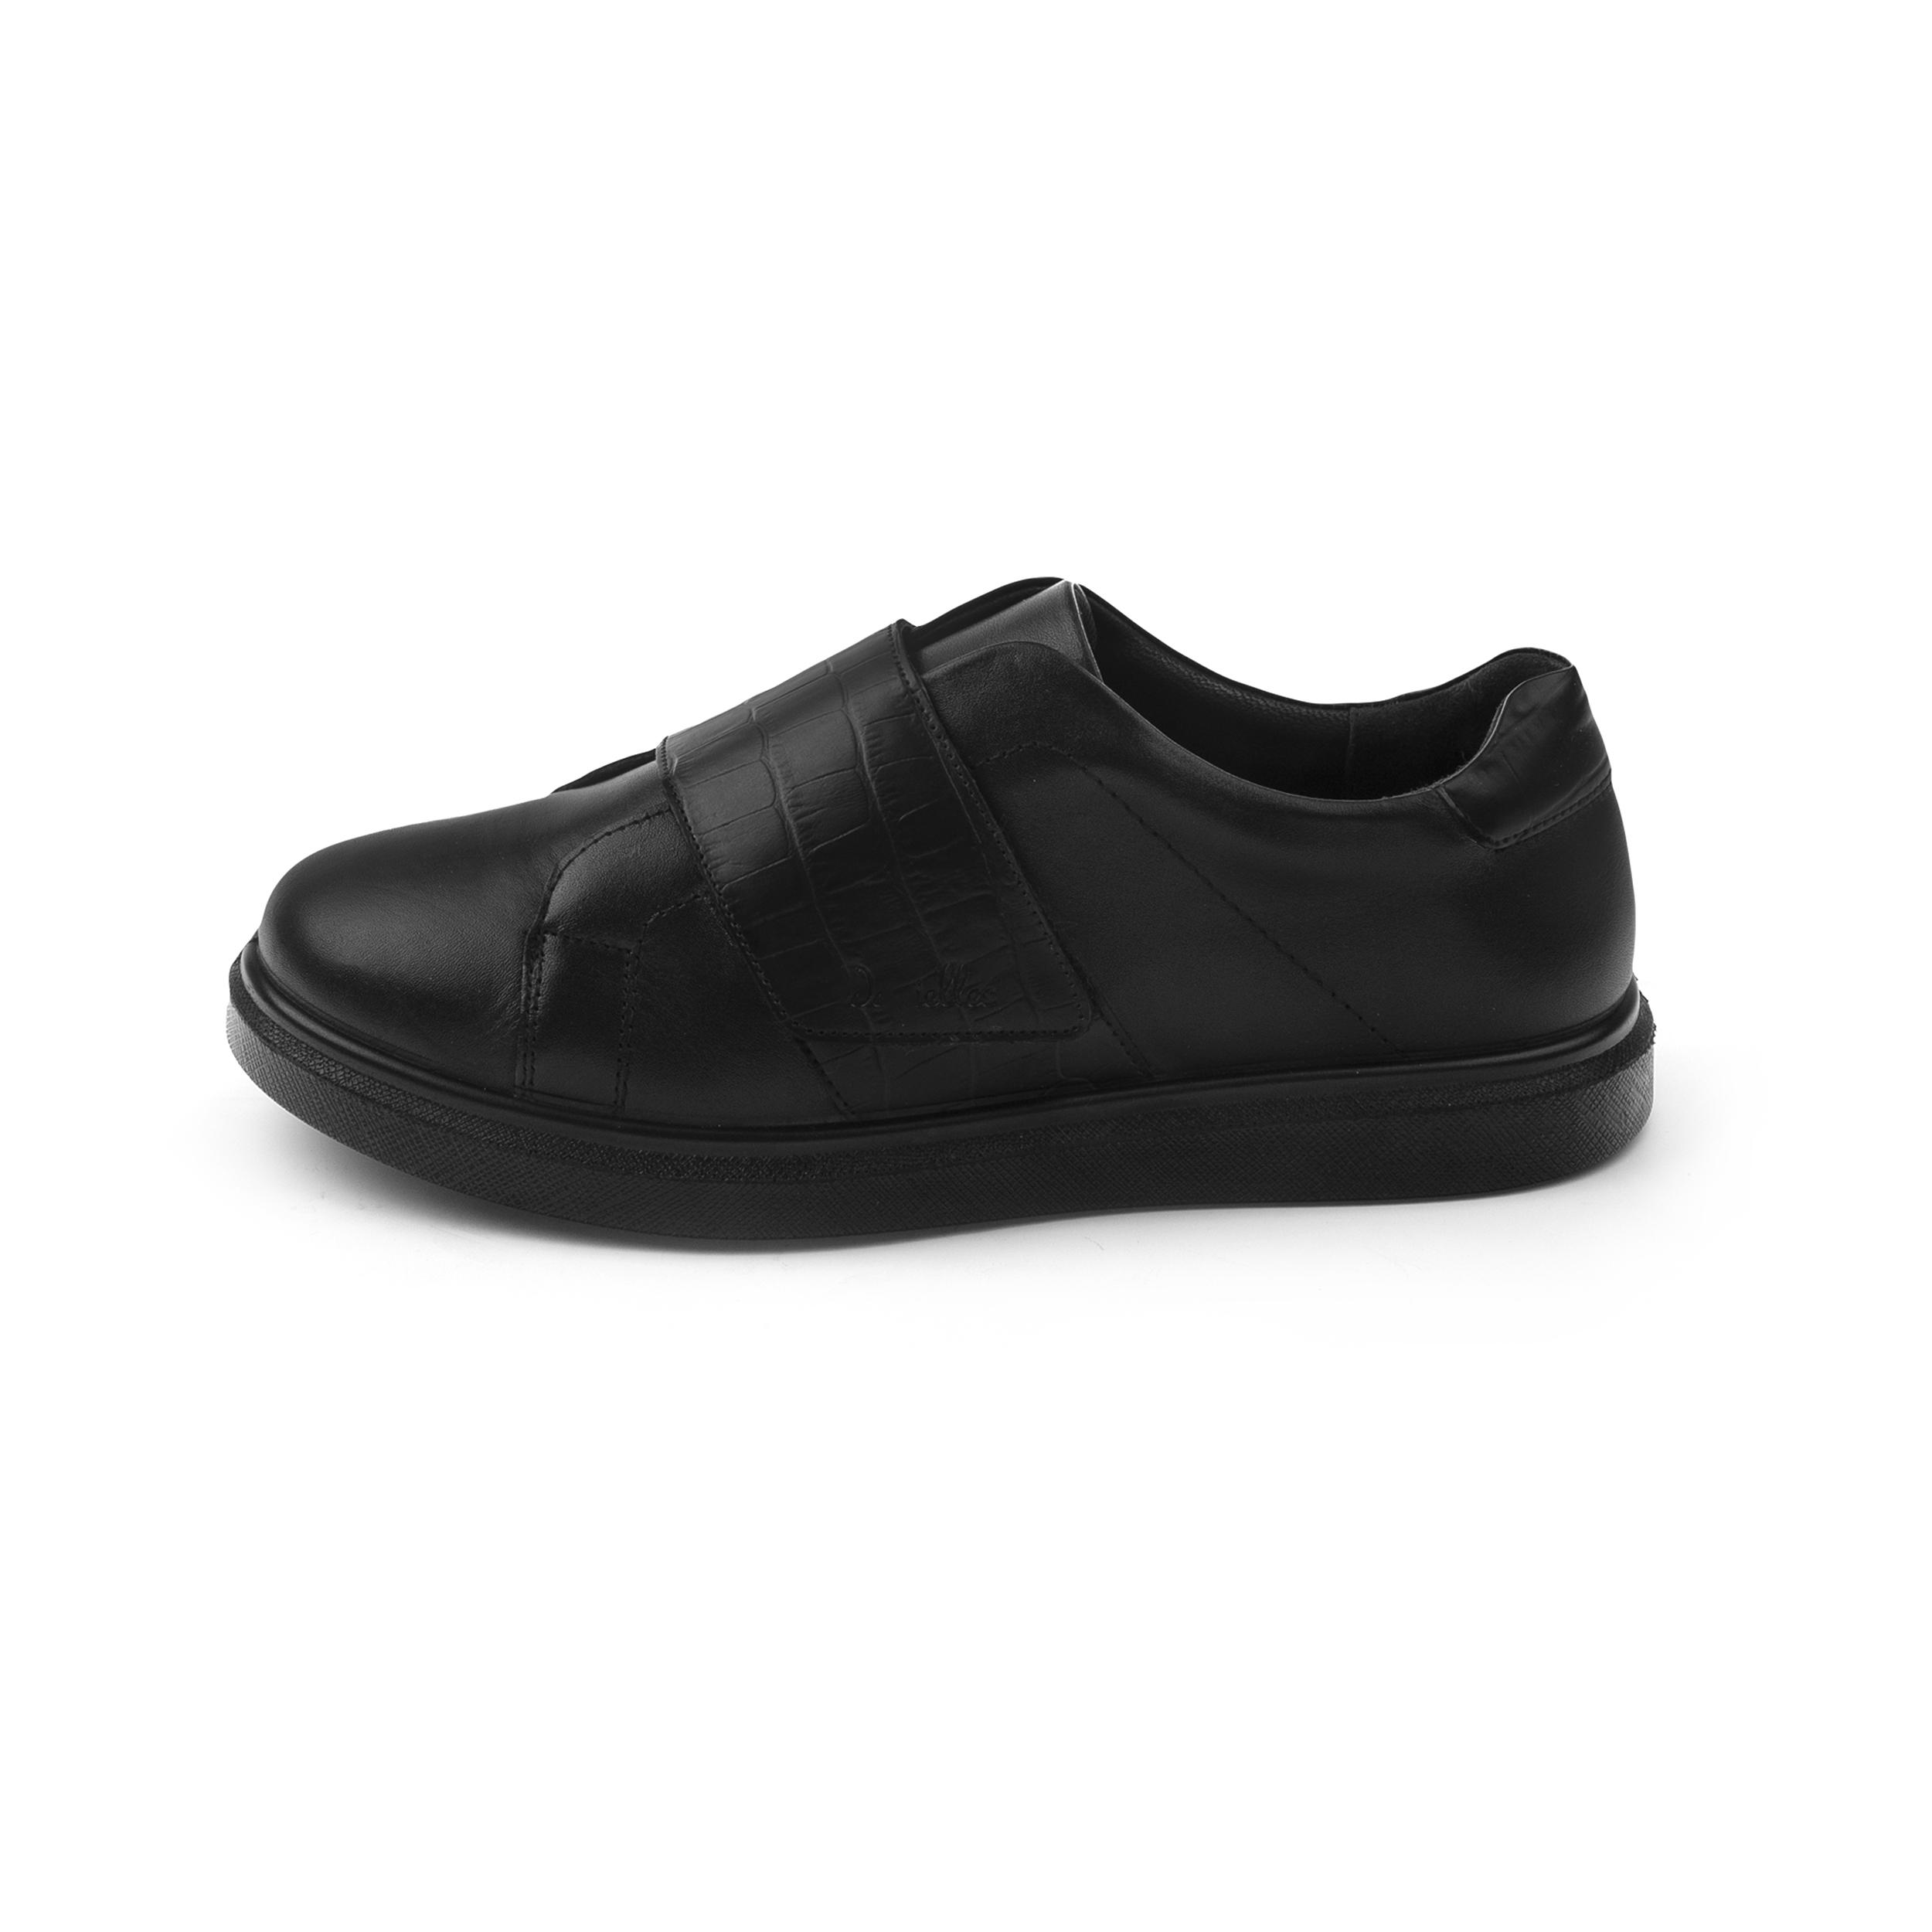 کفش روزمره زنانه دنیلی مدل Ariol-205080061021